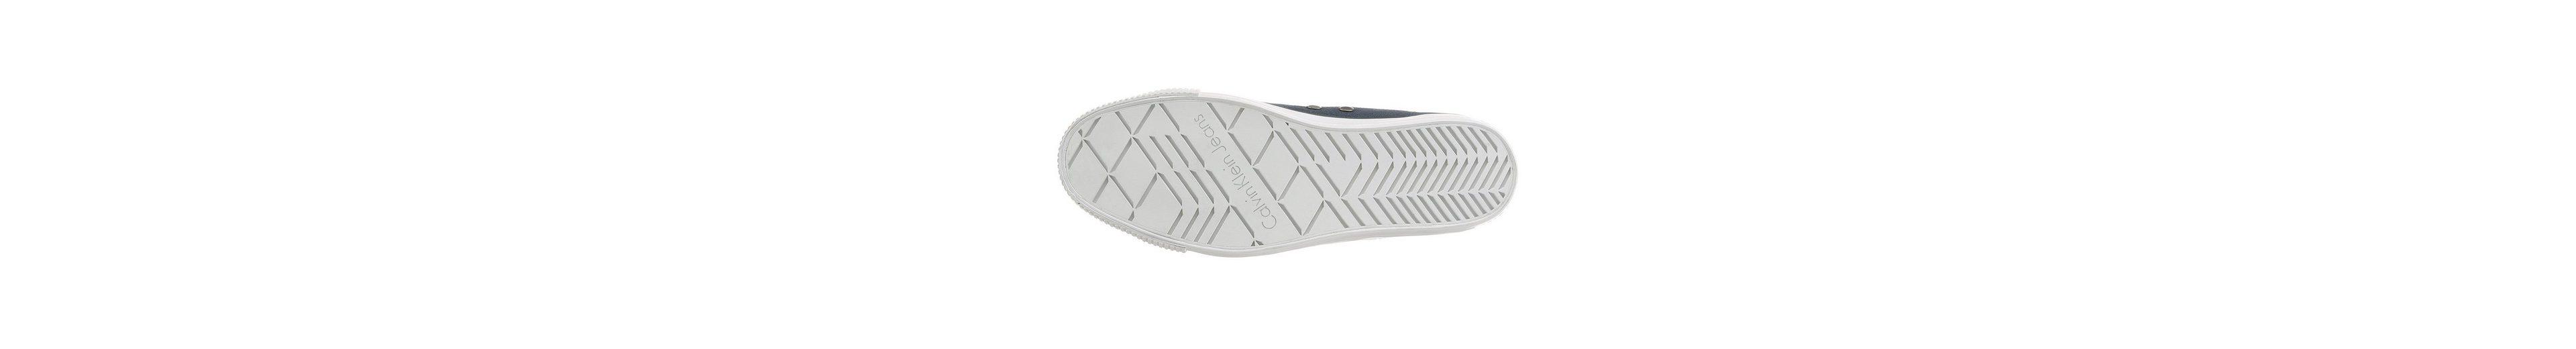 Calvin Klein Sneaker Billig Bester Laden Zu Bekommen Rabatt-Websites Freies Verschiffen Größte Lieferant zfsJDUnY2